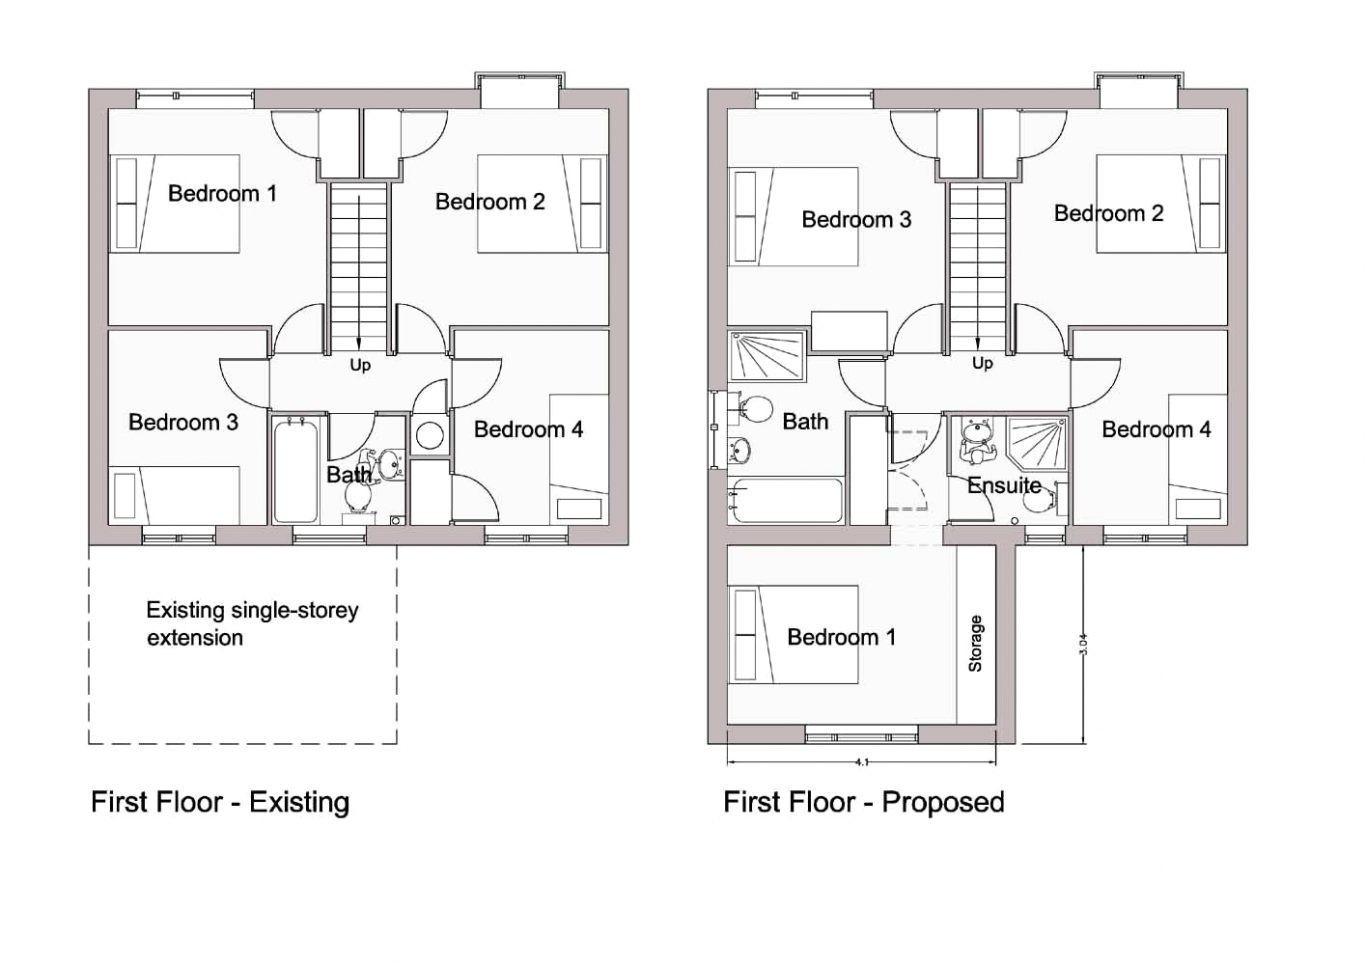 karsten homes floor plans awesome free floor plan best inspirational floor plan free home house of